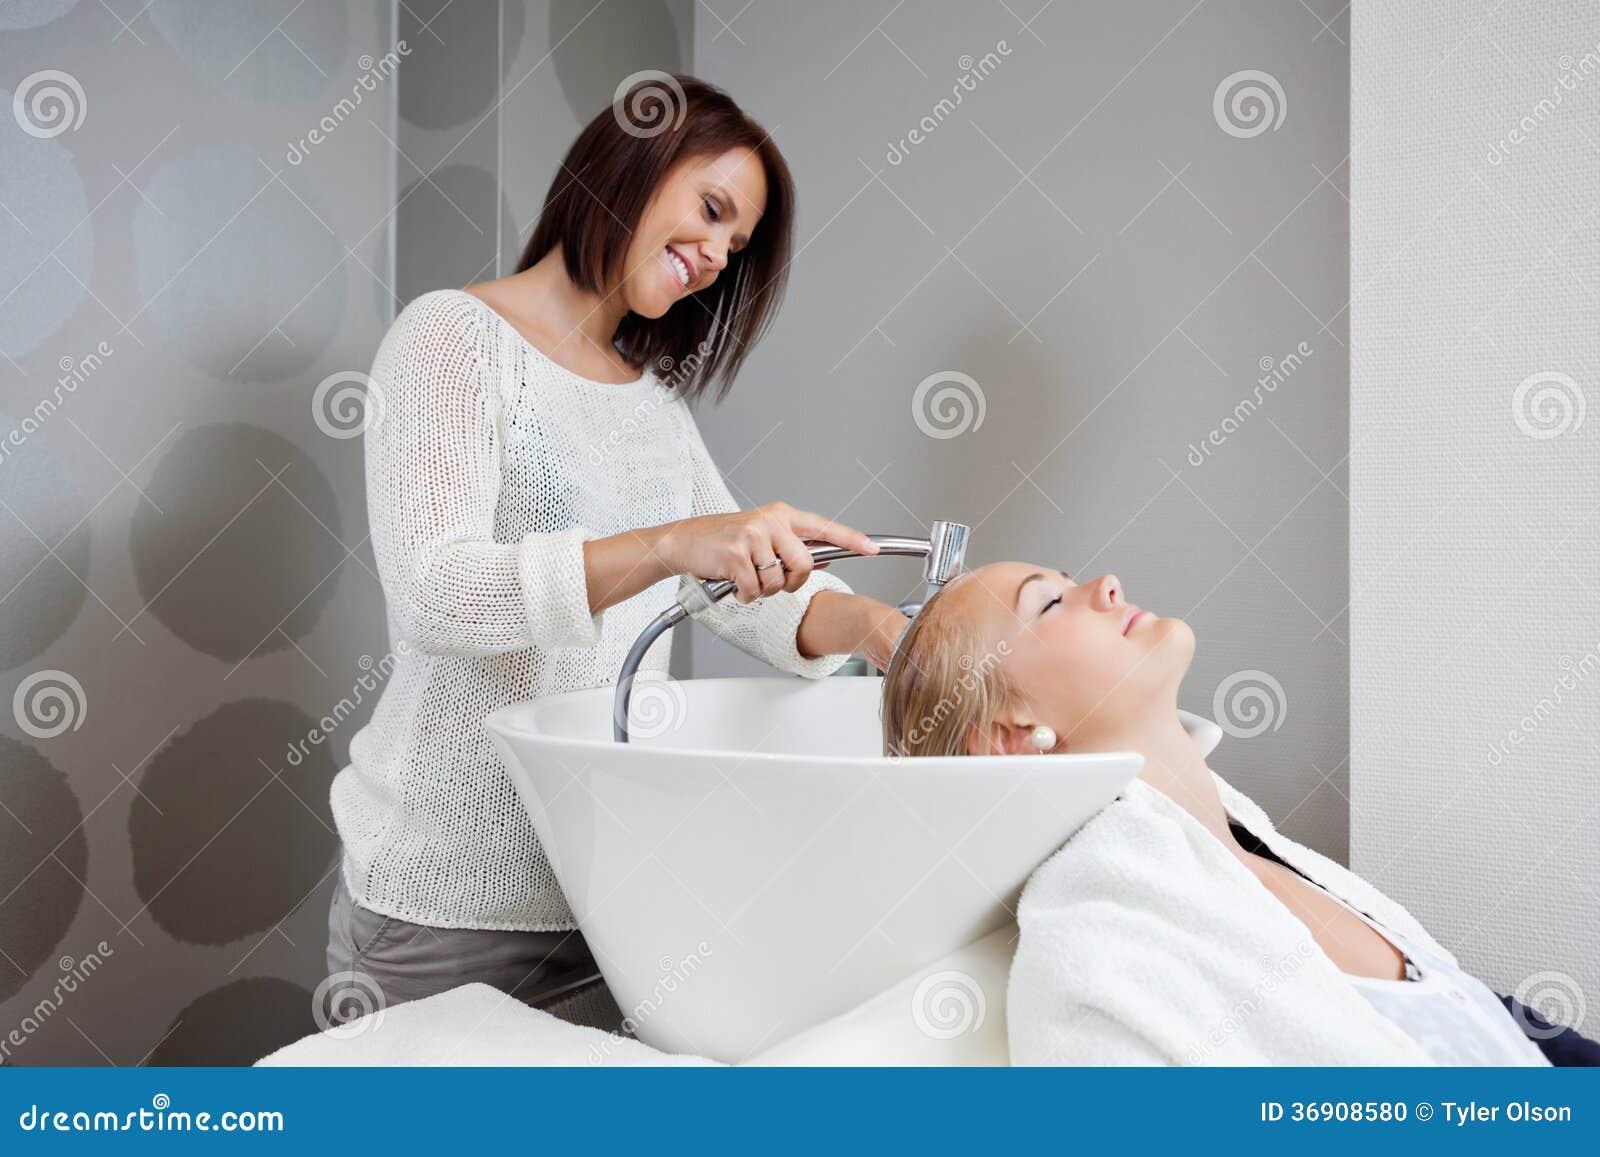 Beautician washing hair of customer stock photo image for Wash hair salon